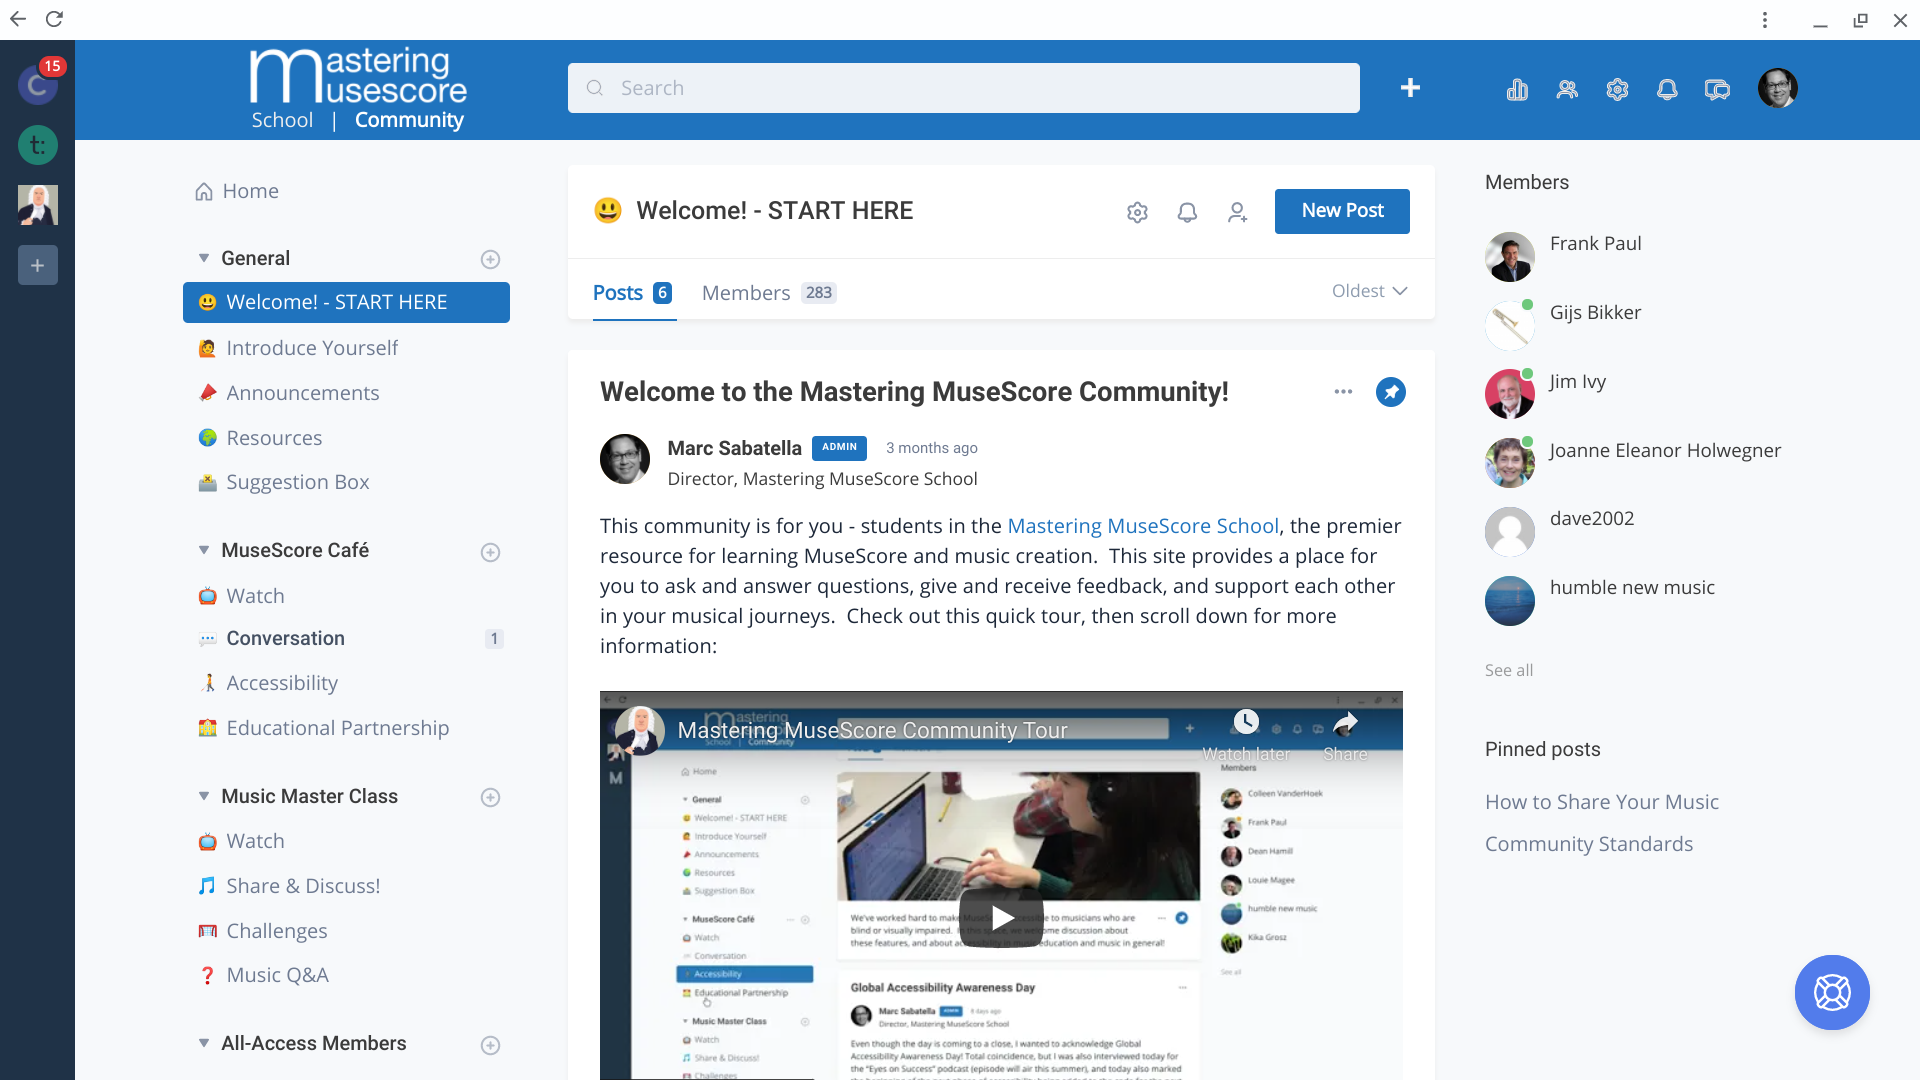 Mastering MuseScore Community